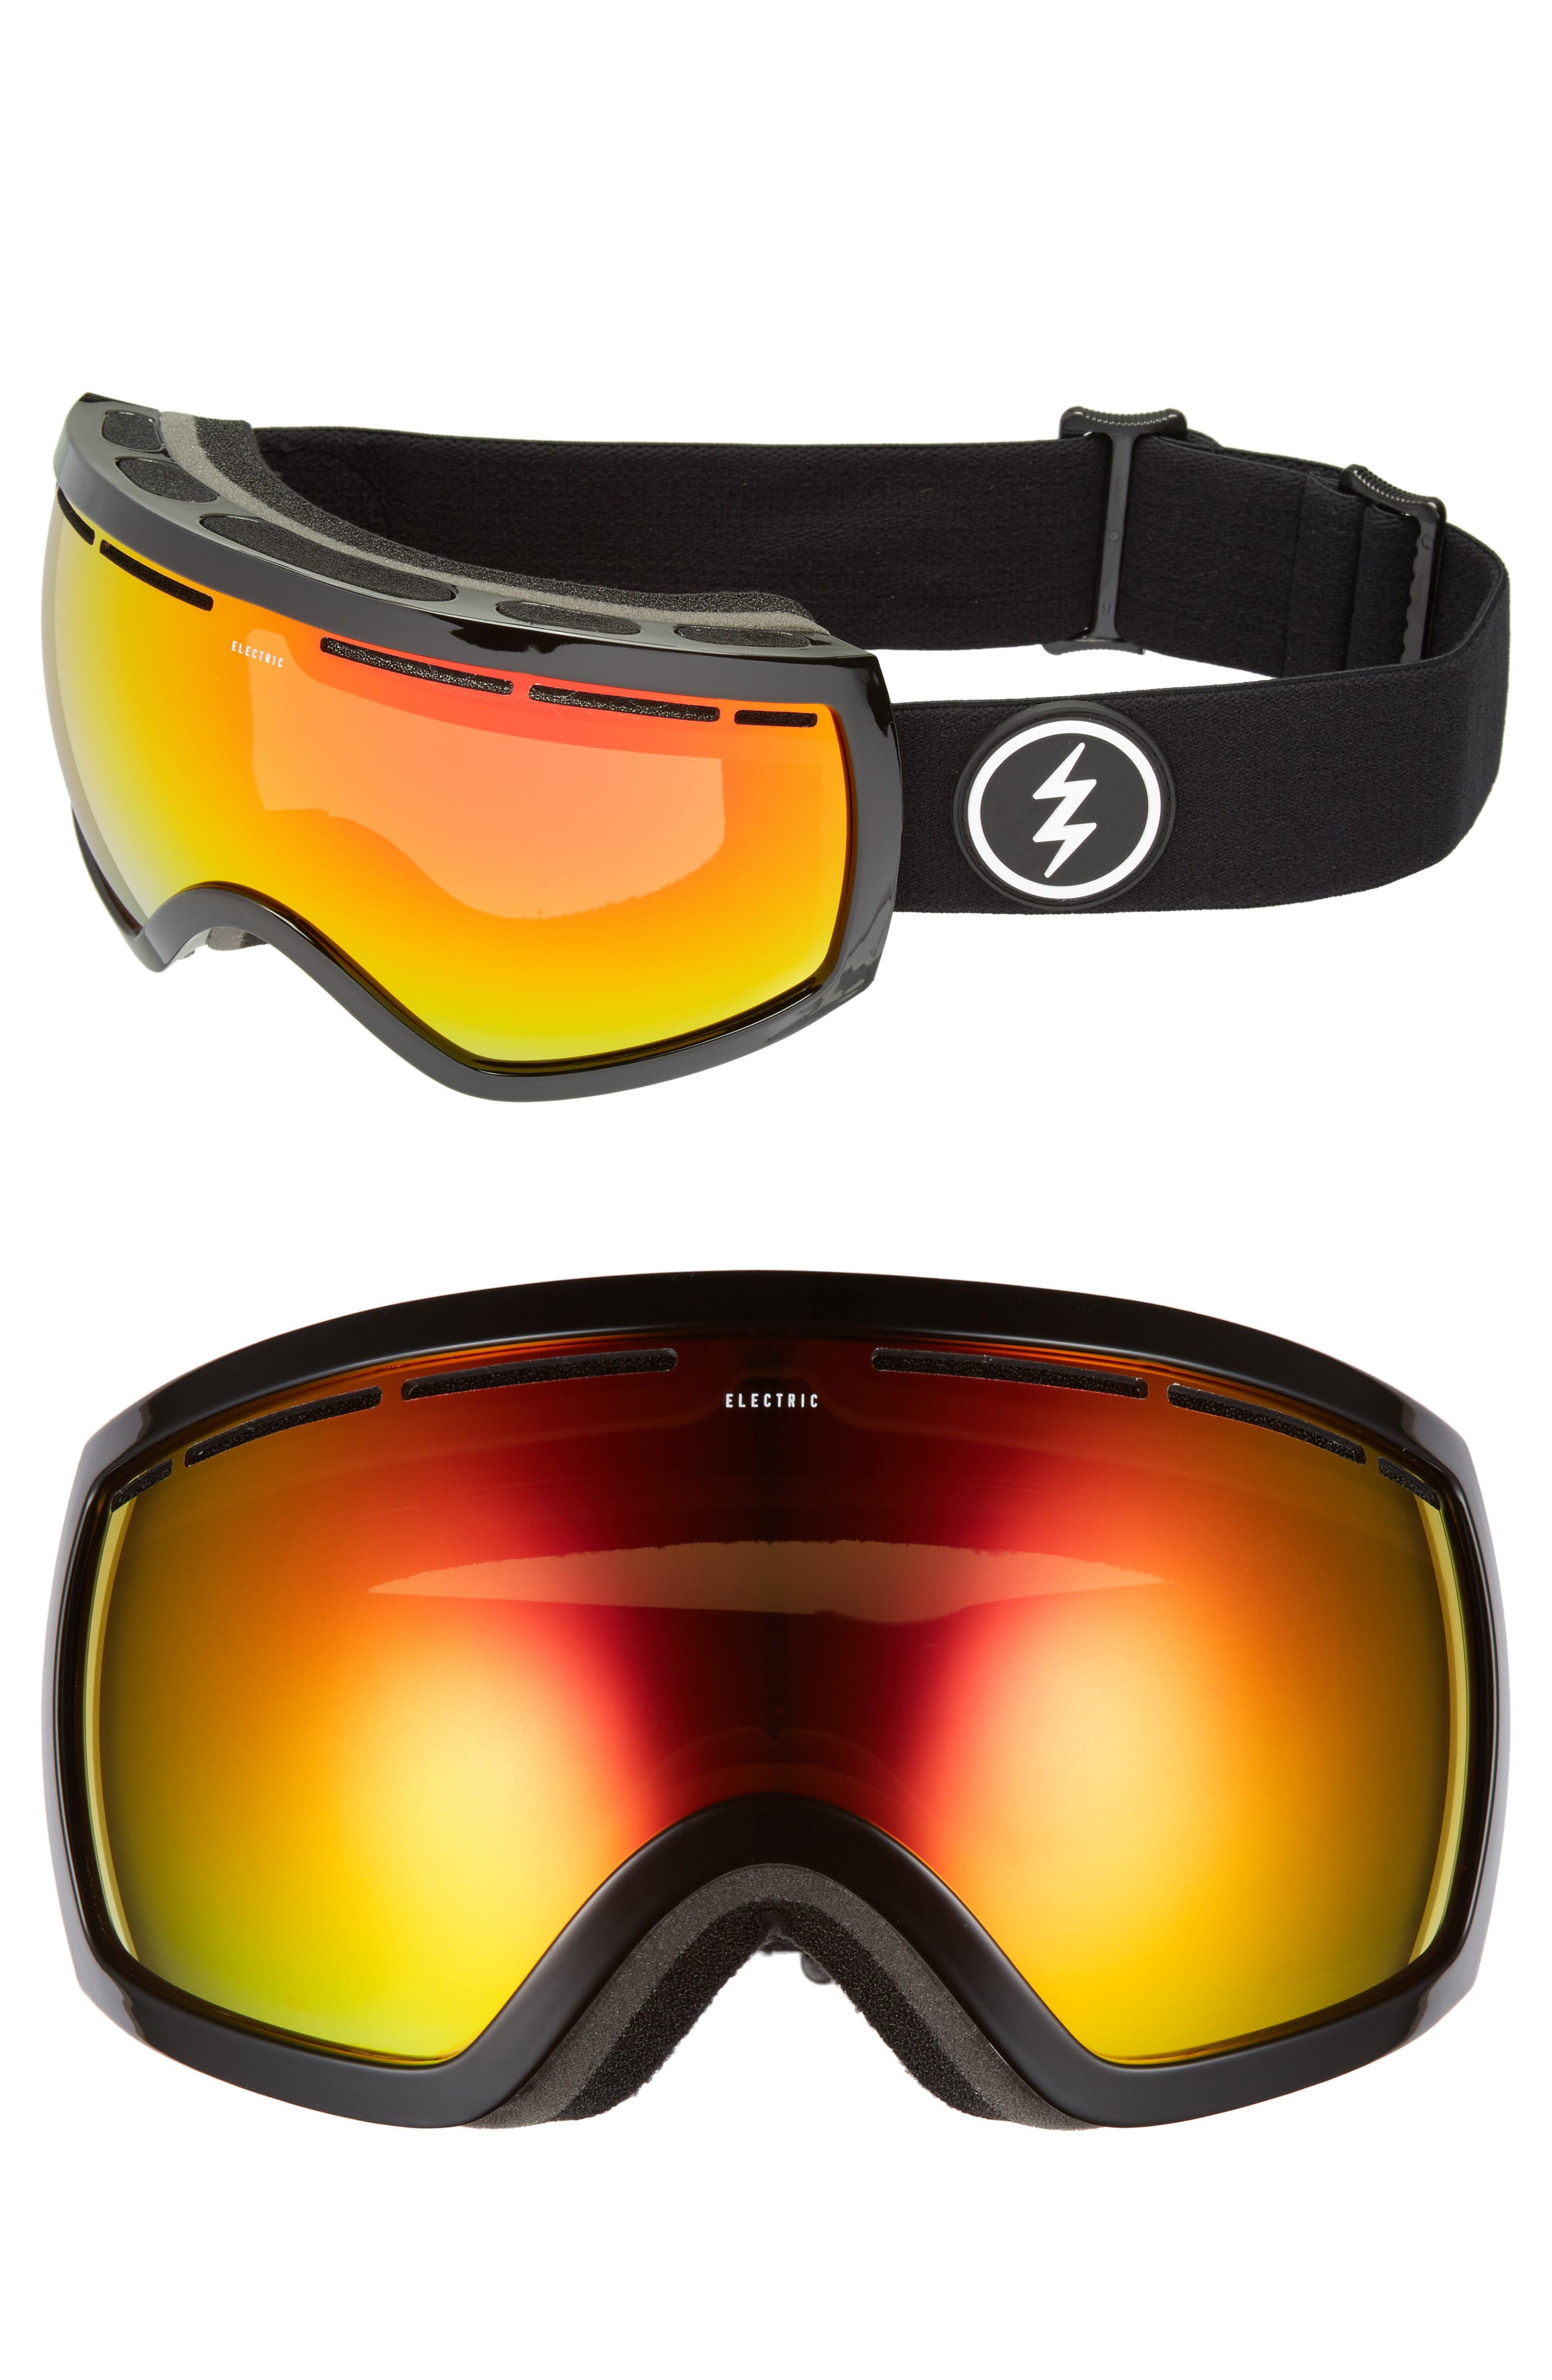 EG2.5 Snow Goggles,                             Main thumbnail 1, color,